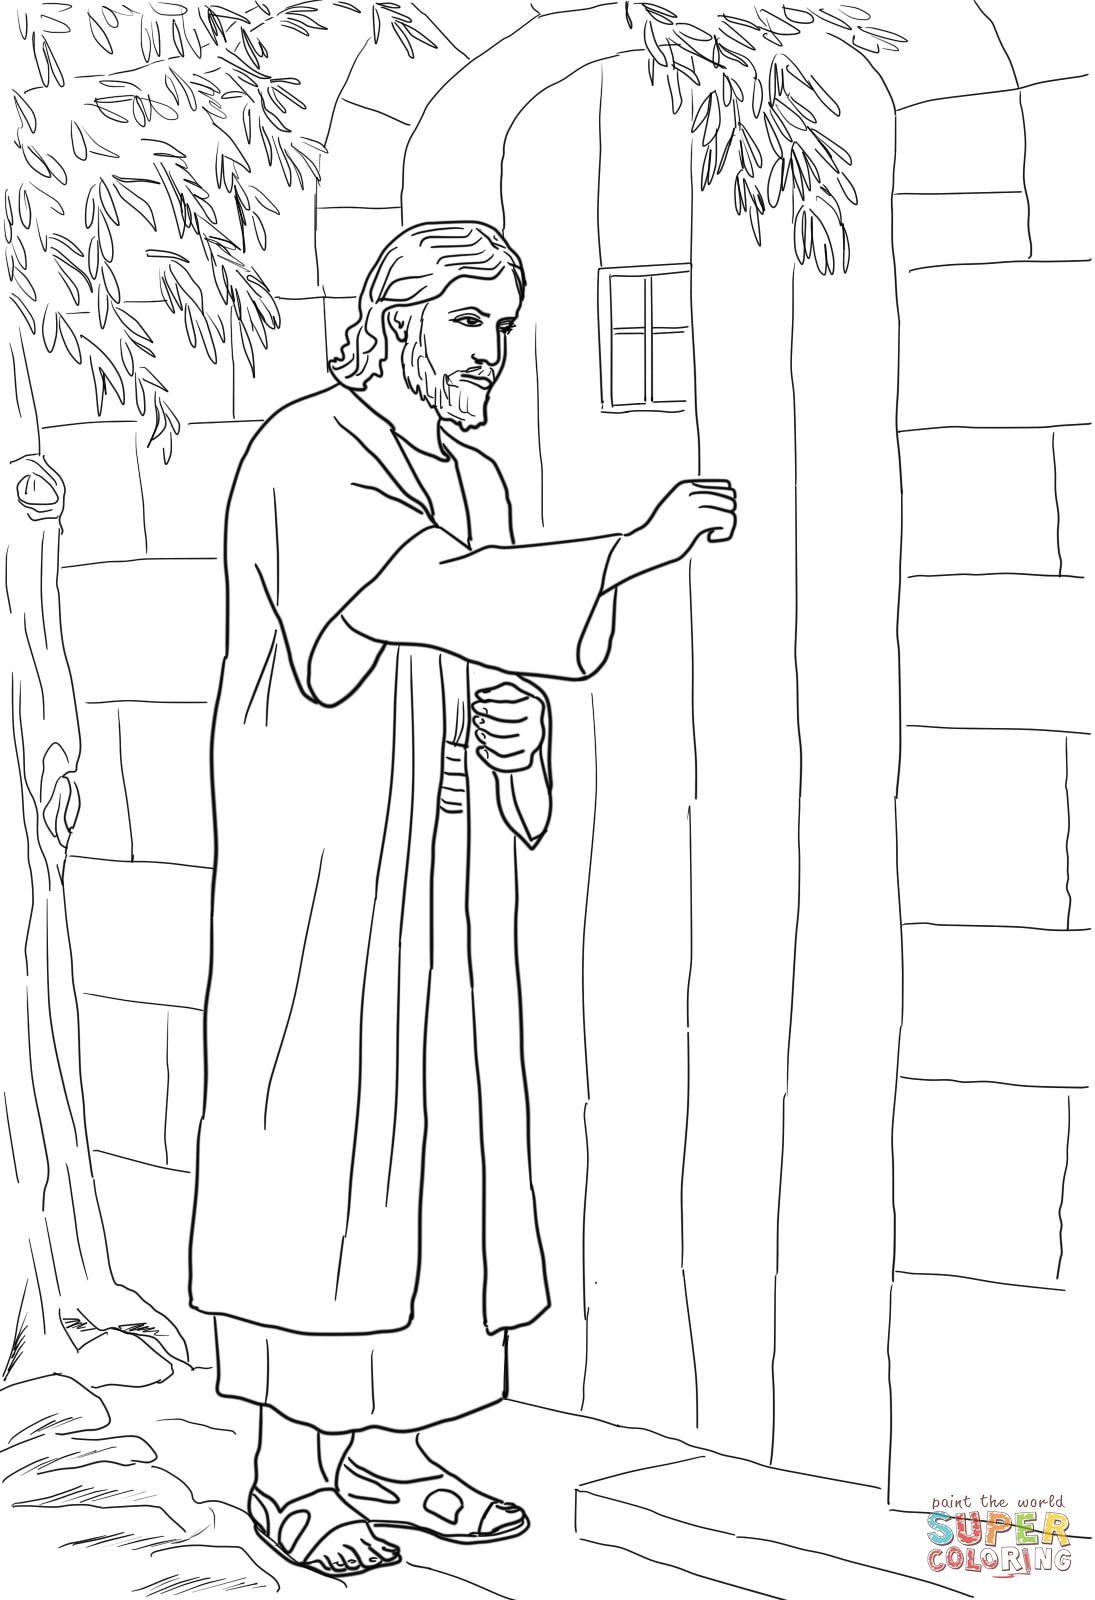 Jesus Knocking At The Door Coloring Page Jesus Coloring Pages Bible Coloring Pages Bible Coloring